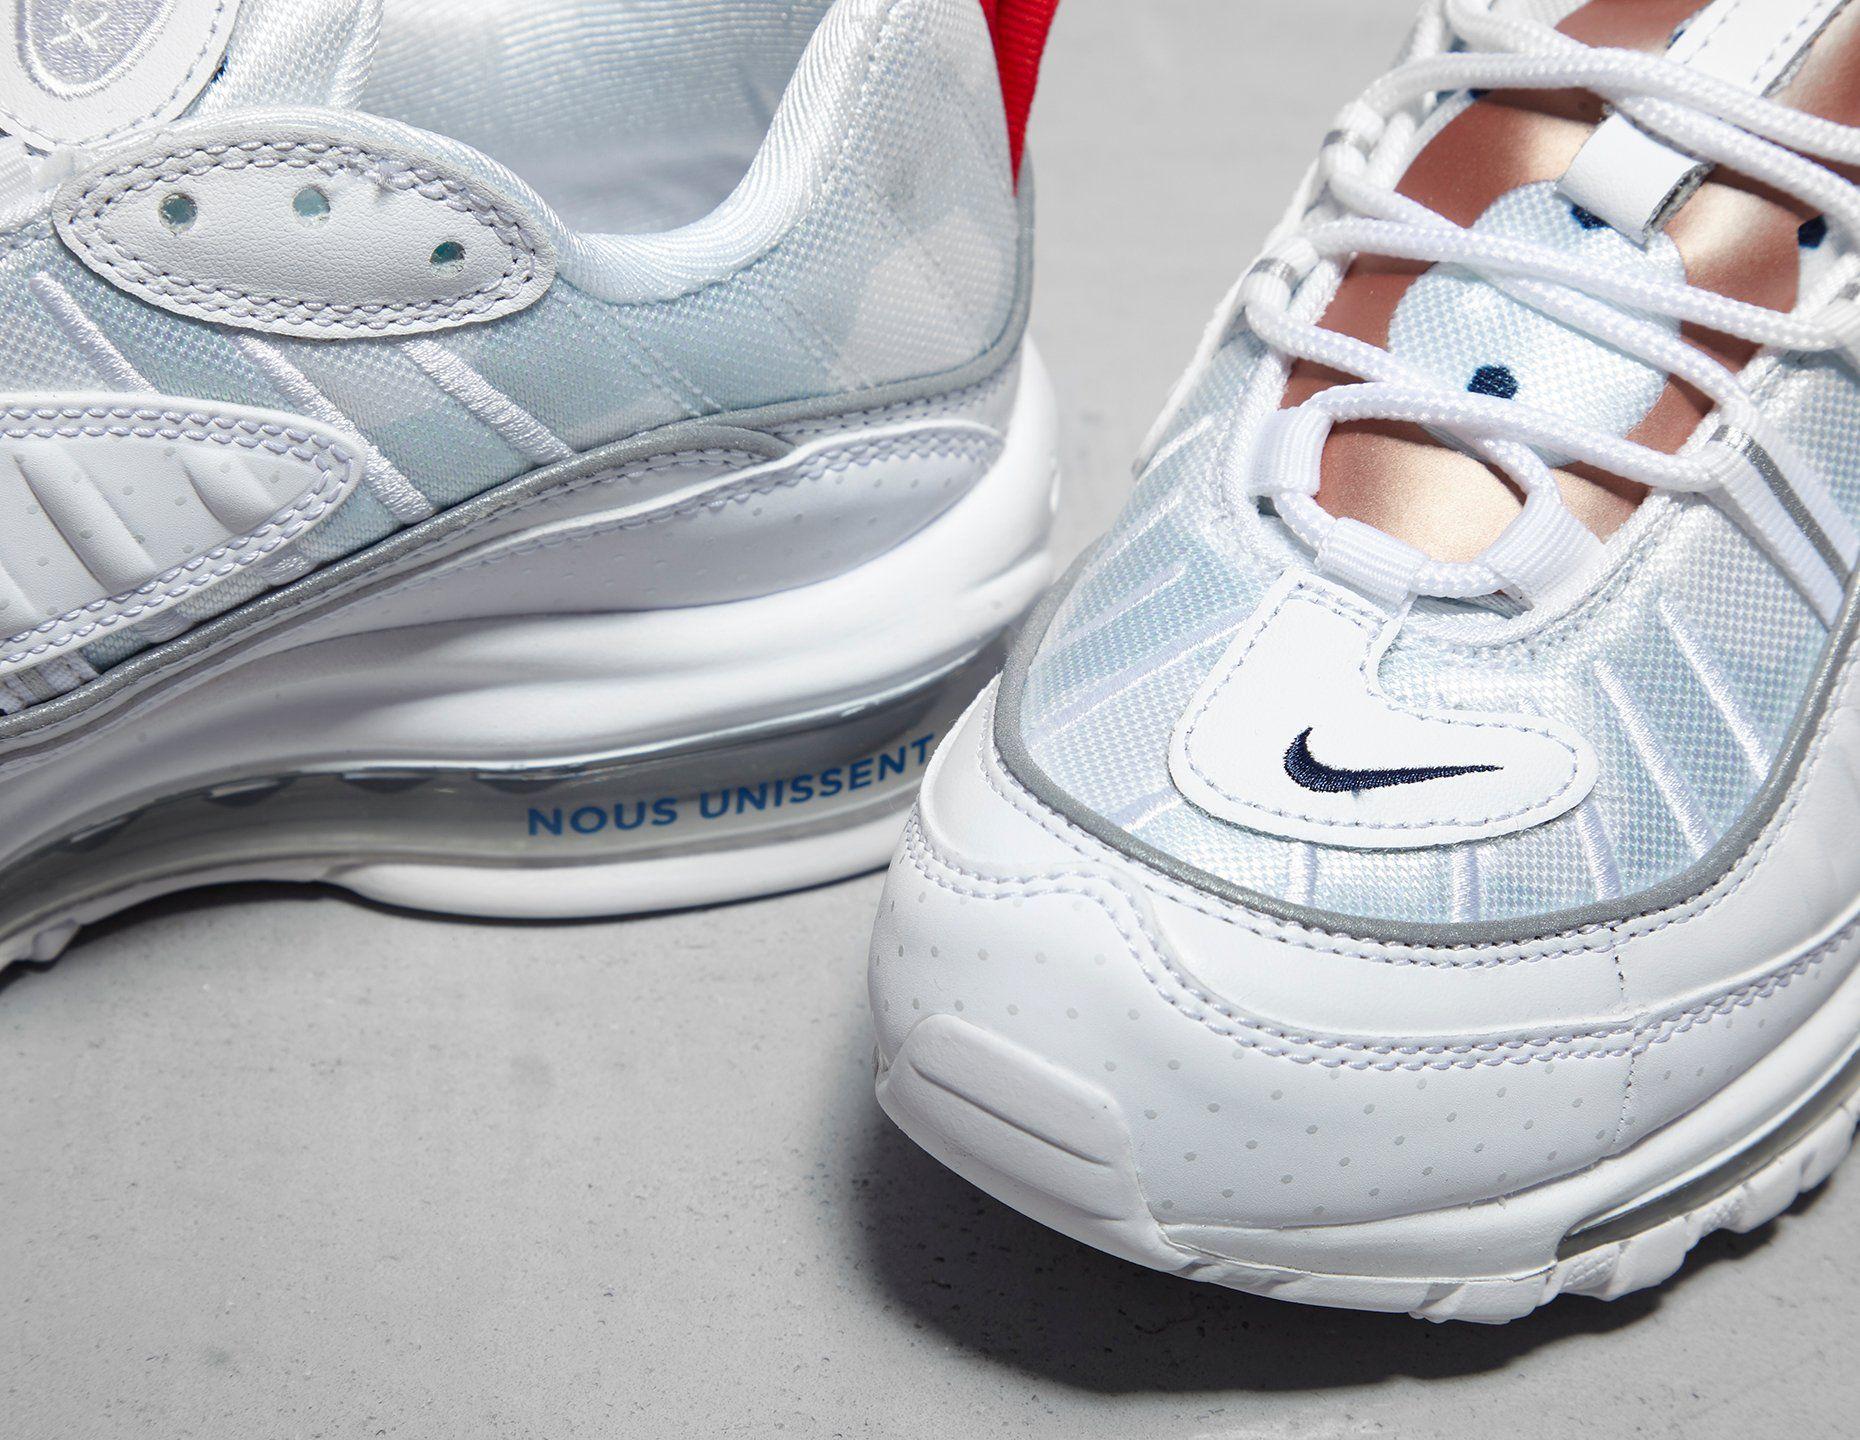 Nike Air Max 98 Premium 'Unité Totale' Women's